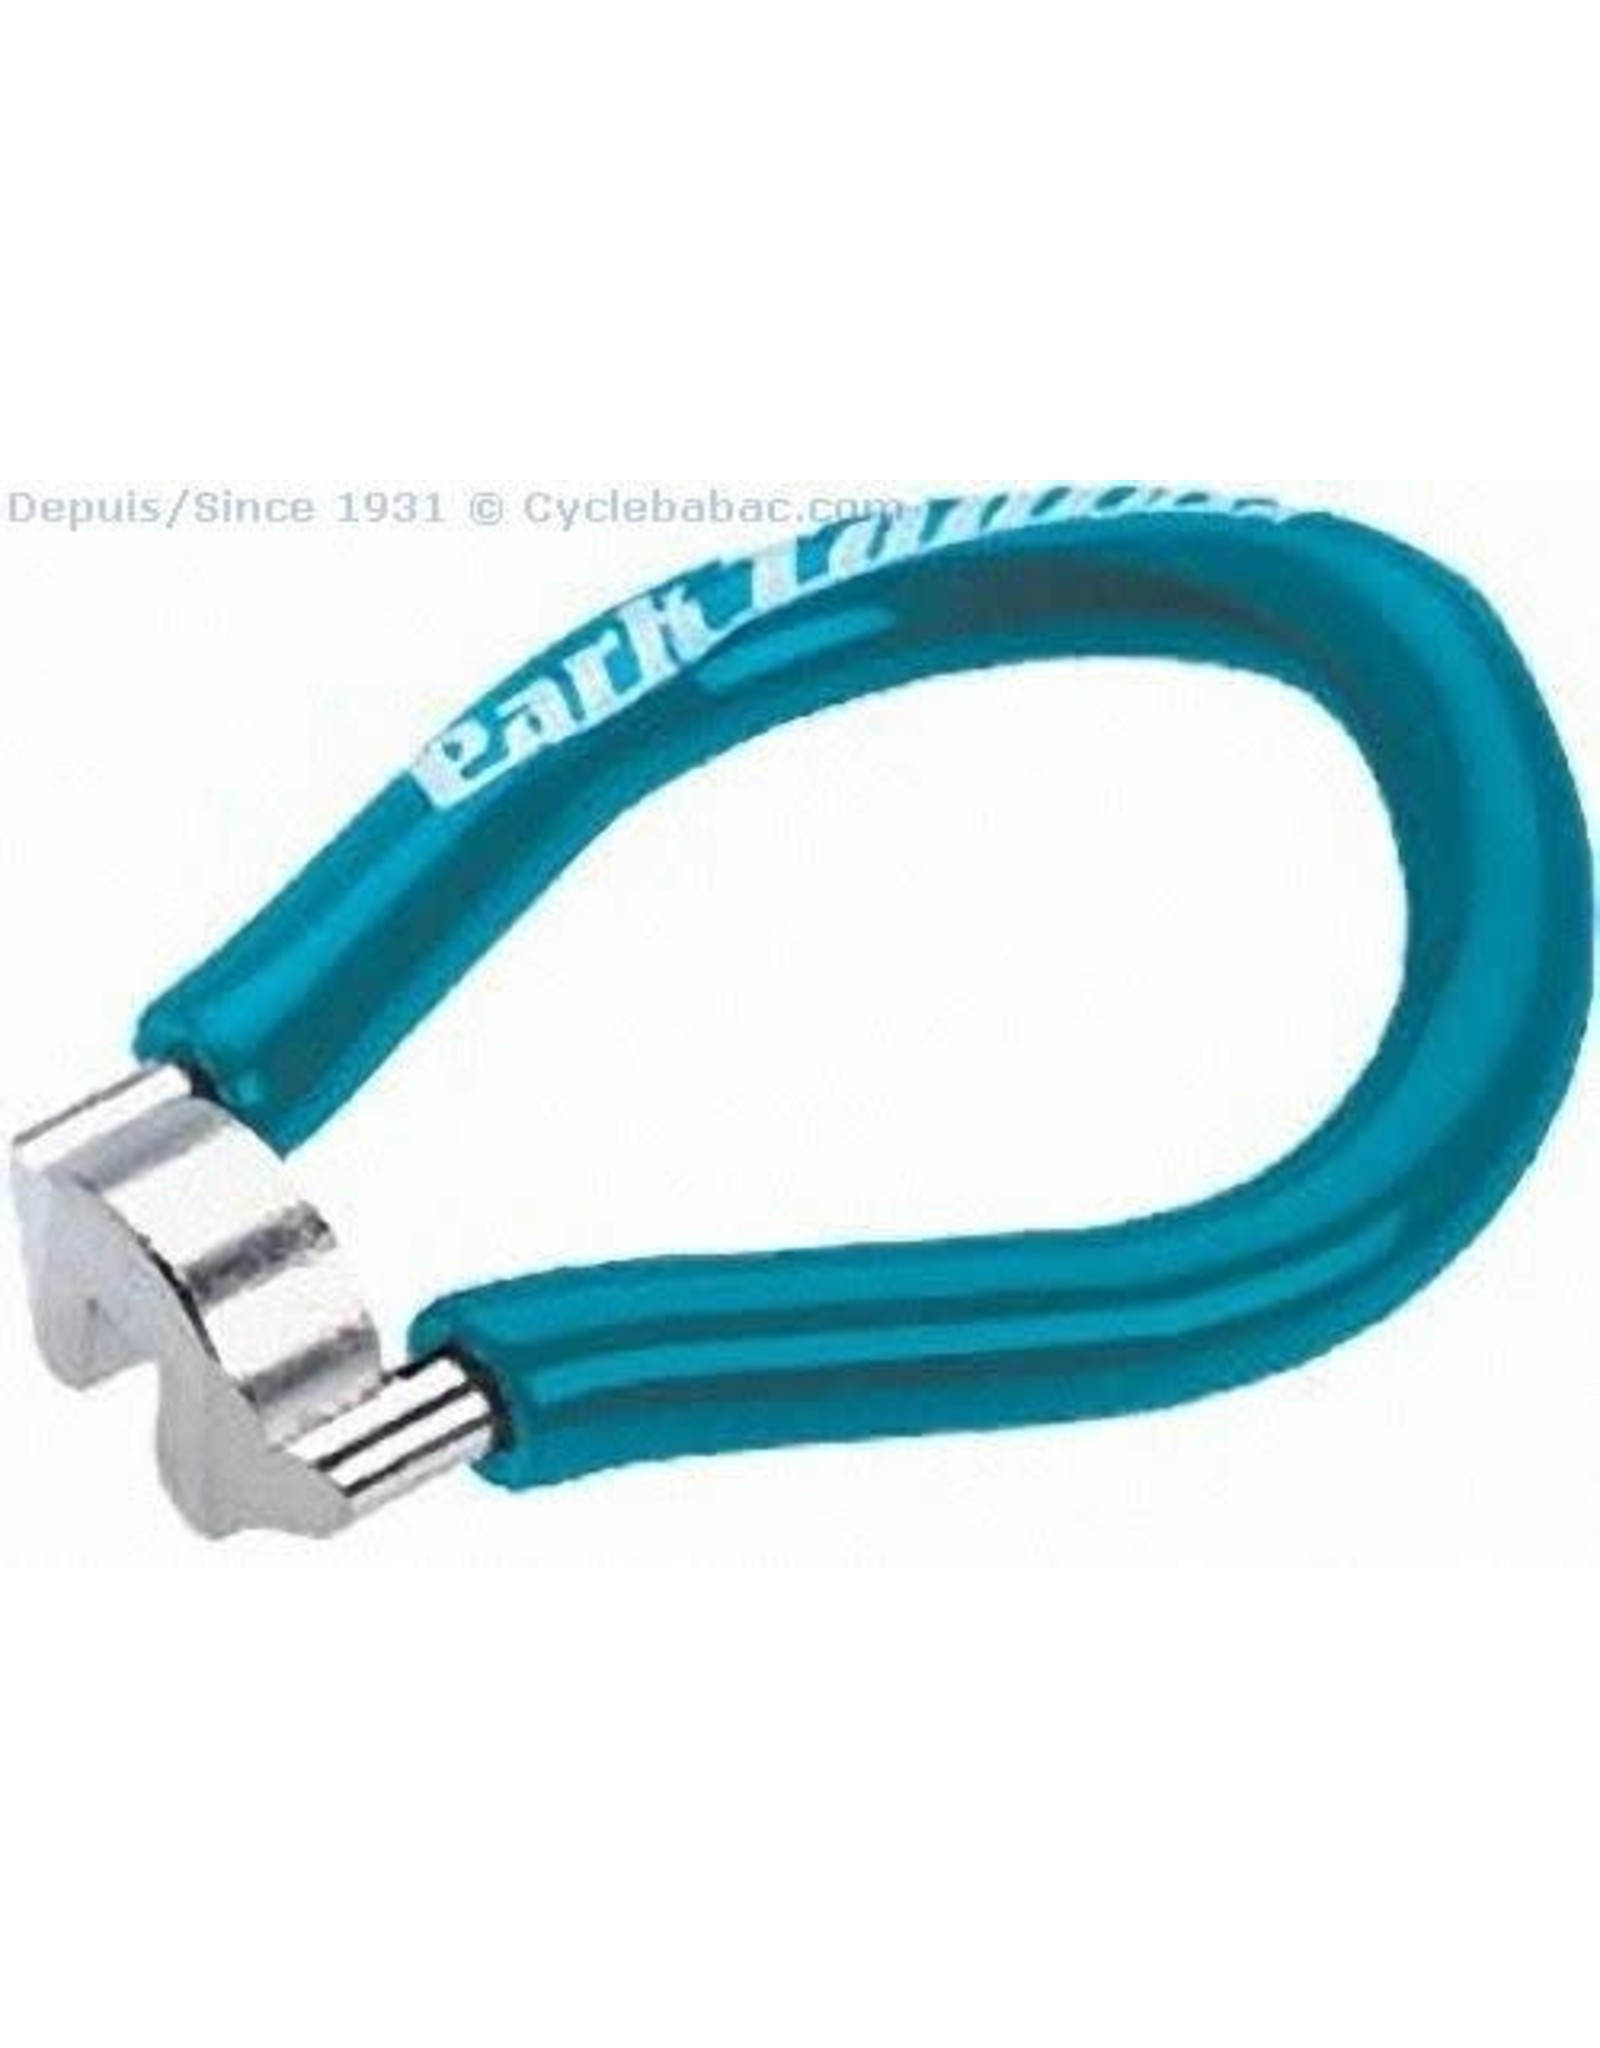 Park tool Spoke Keys